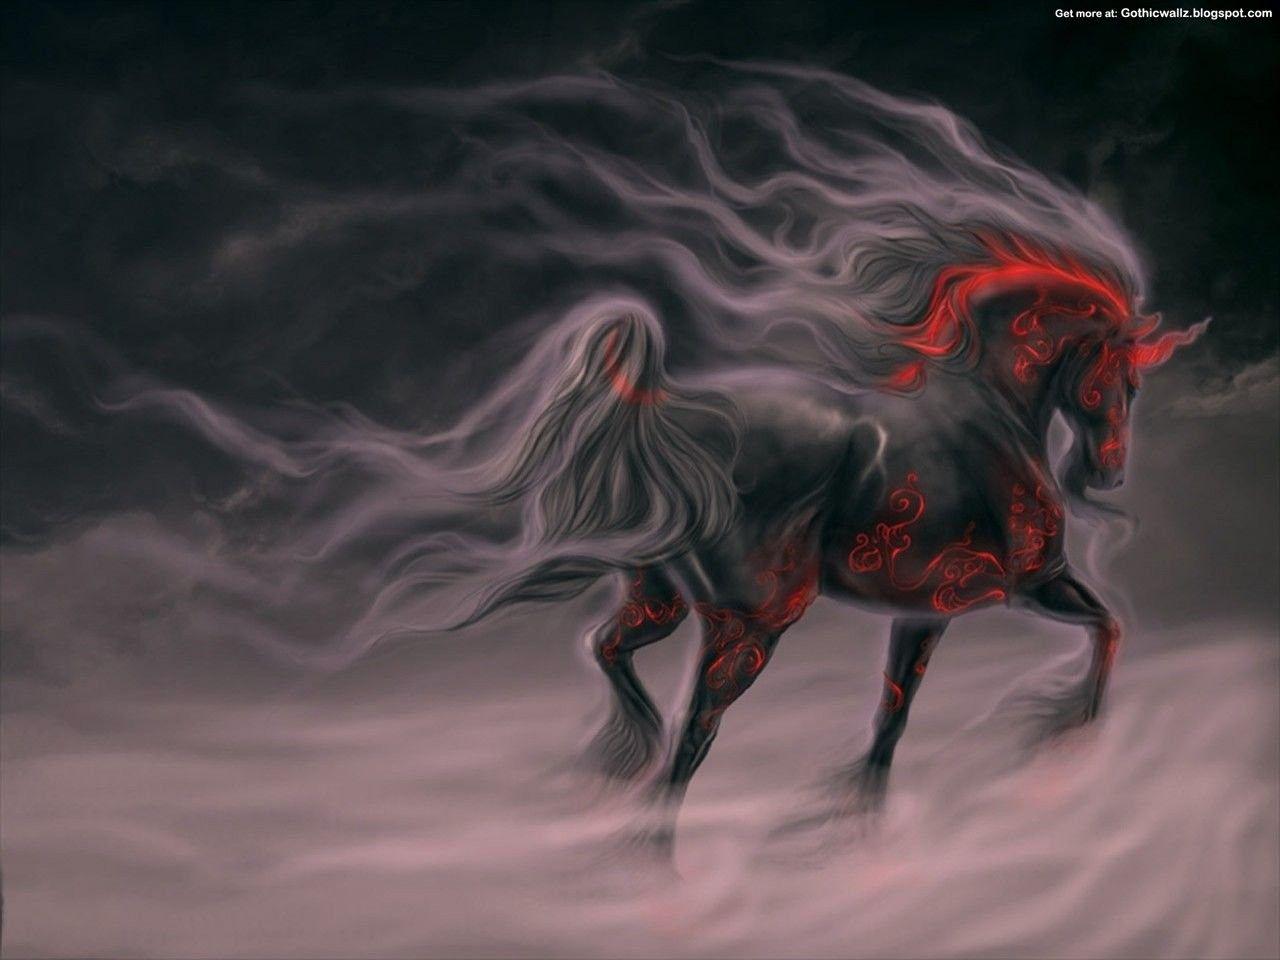 Best Wallpaper Horse Unicorn - 4e9cb086902b14c49dd969ca62d891c7  Pic_288495.jpg